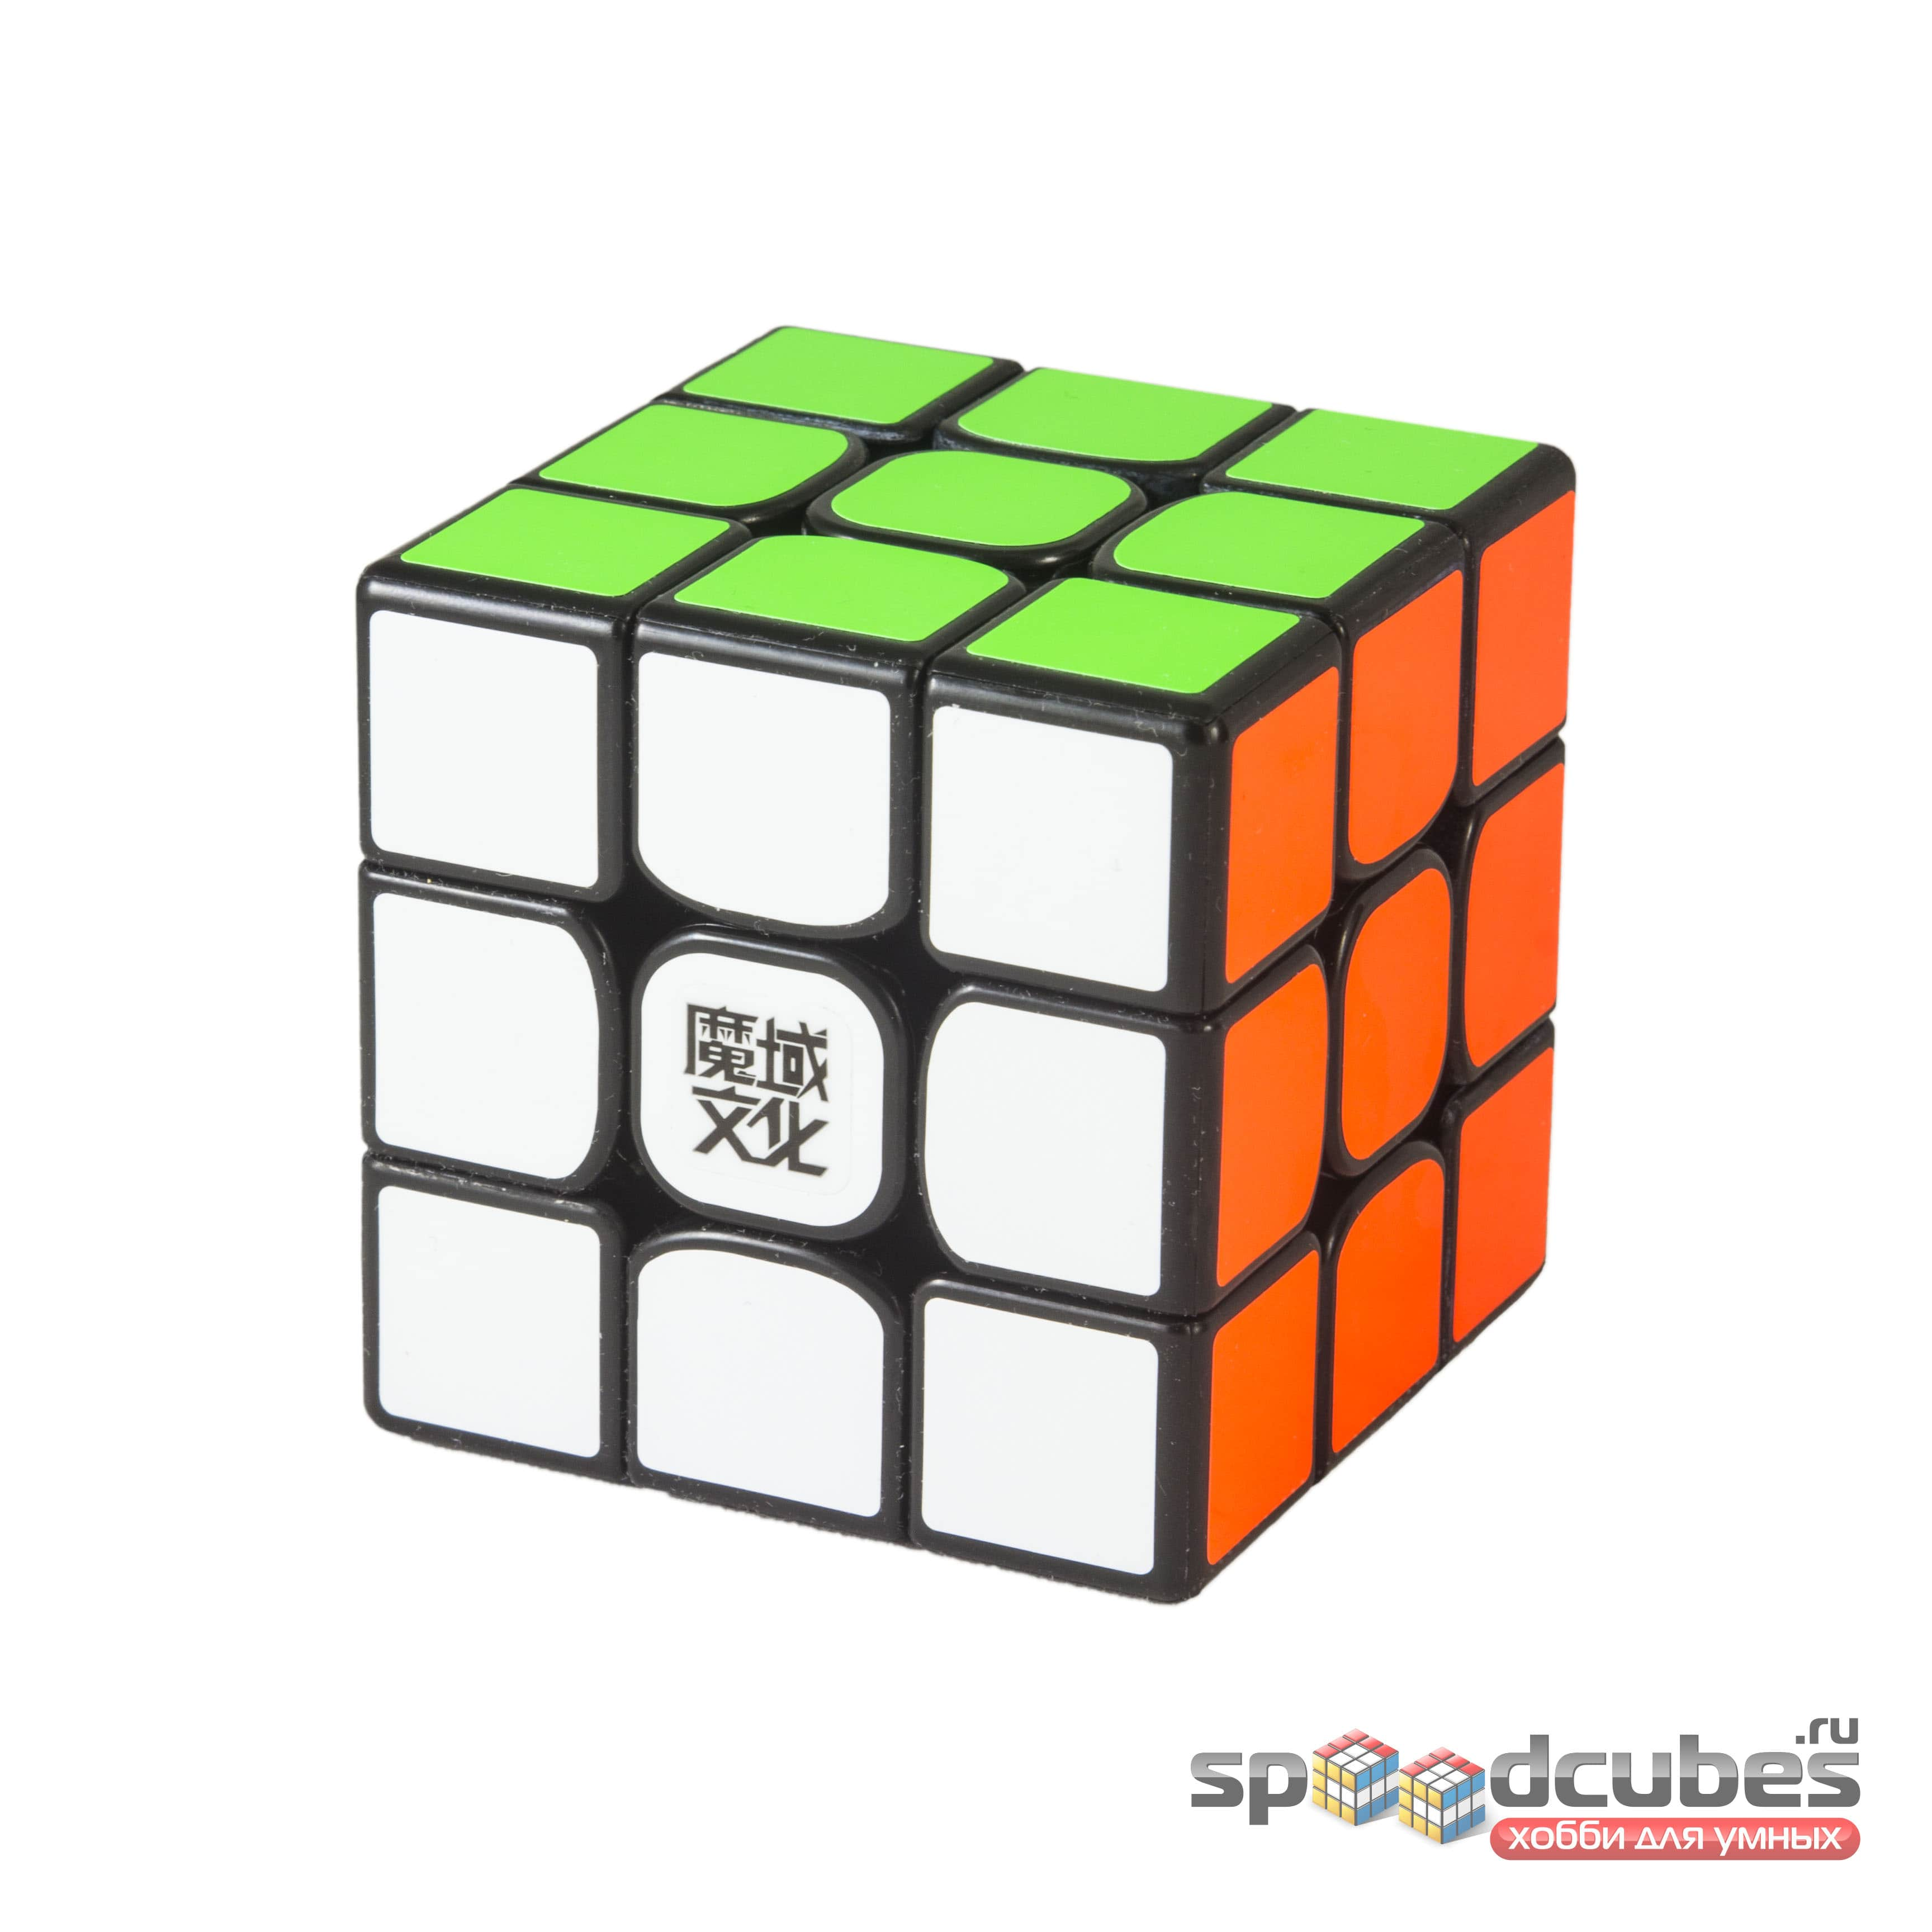 MoYu 3x3x3 Weilong GTS2 M